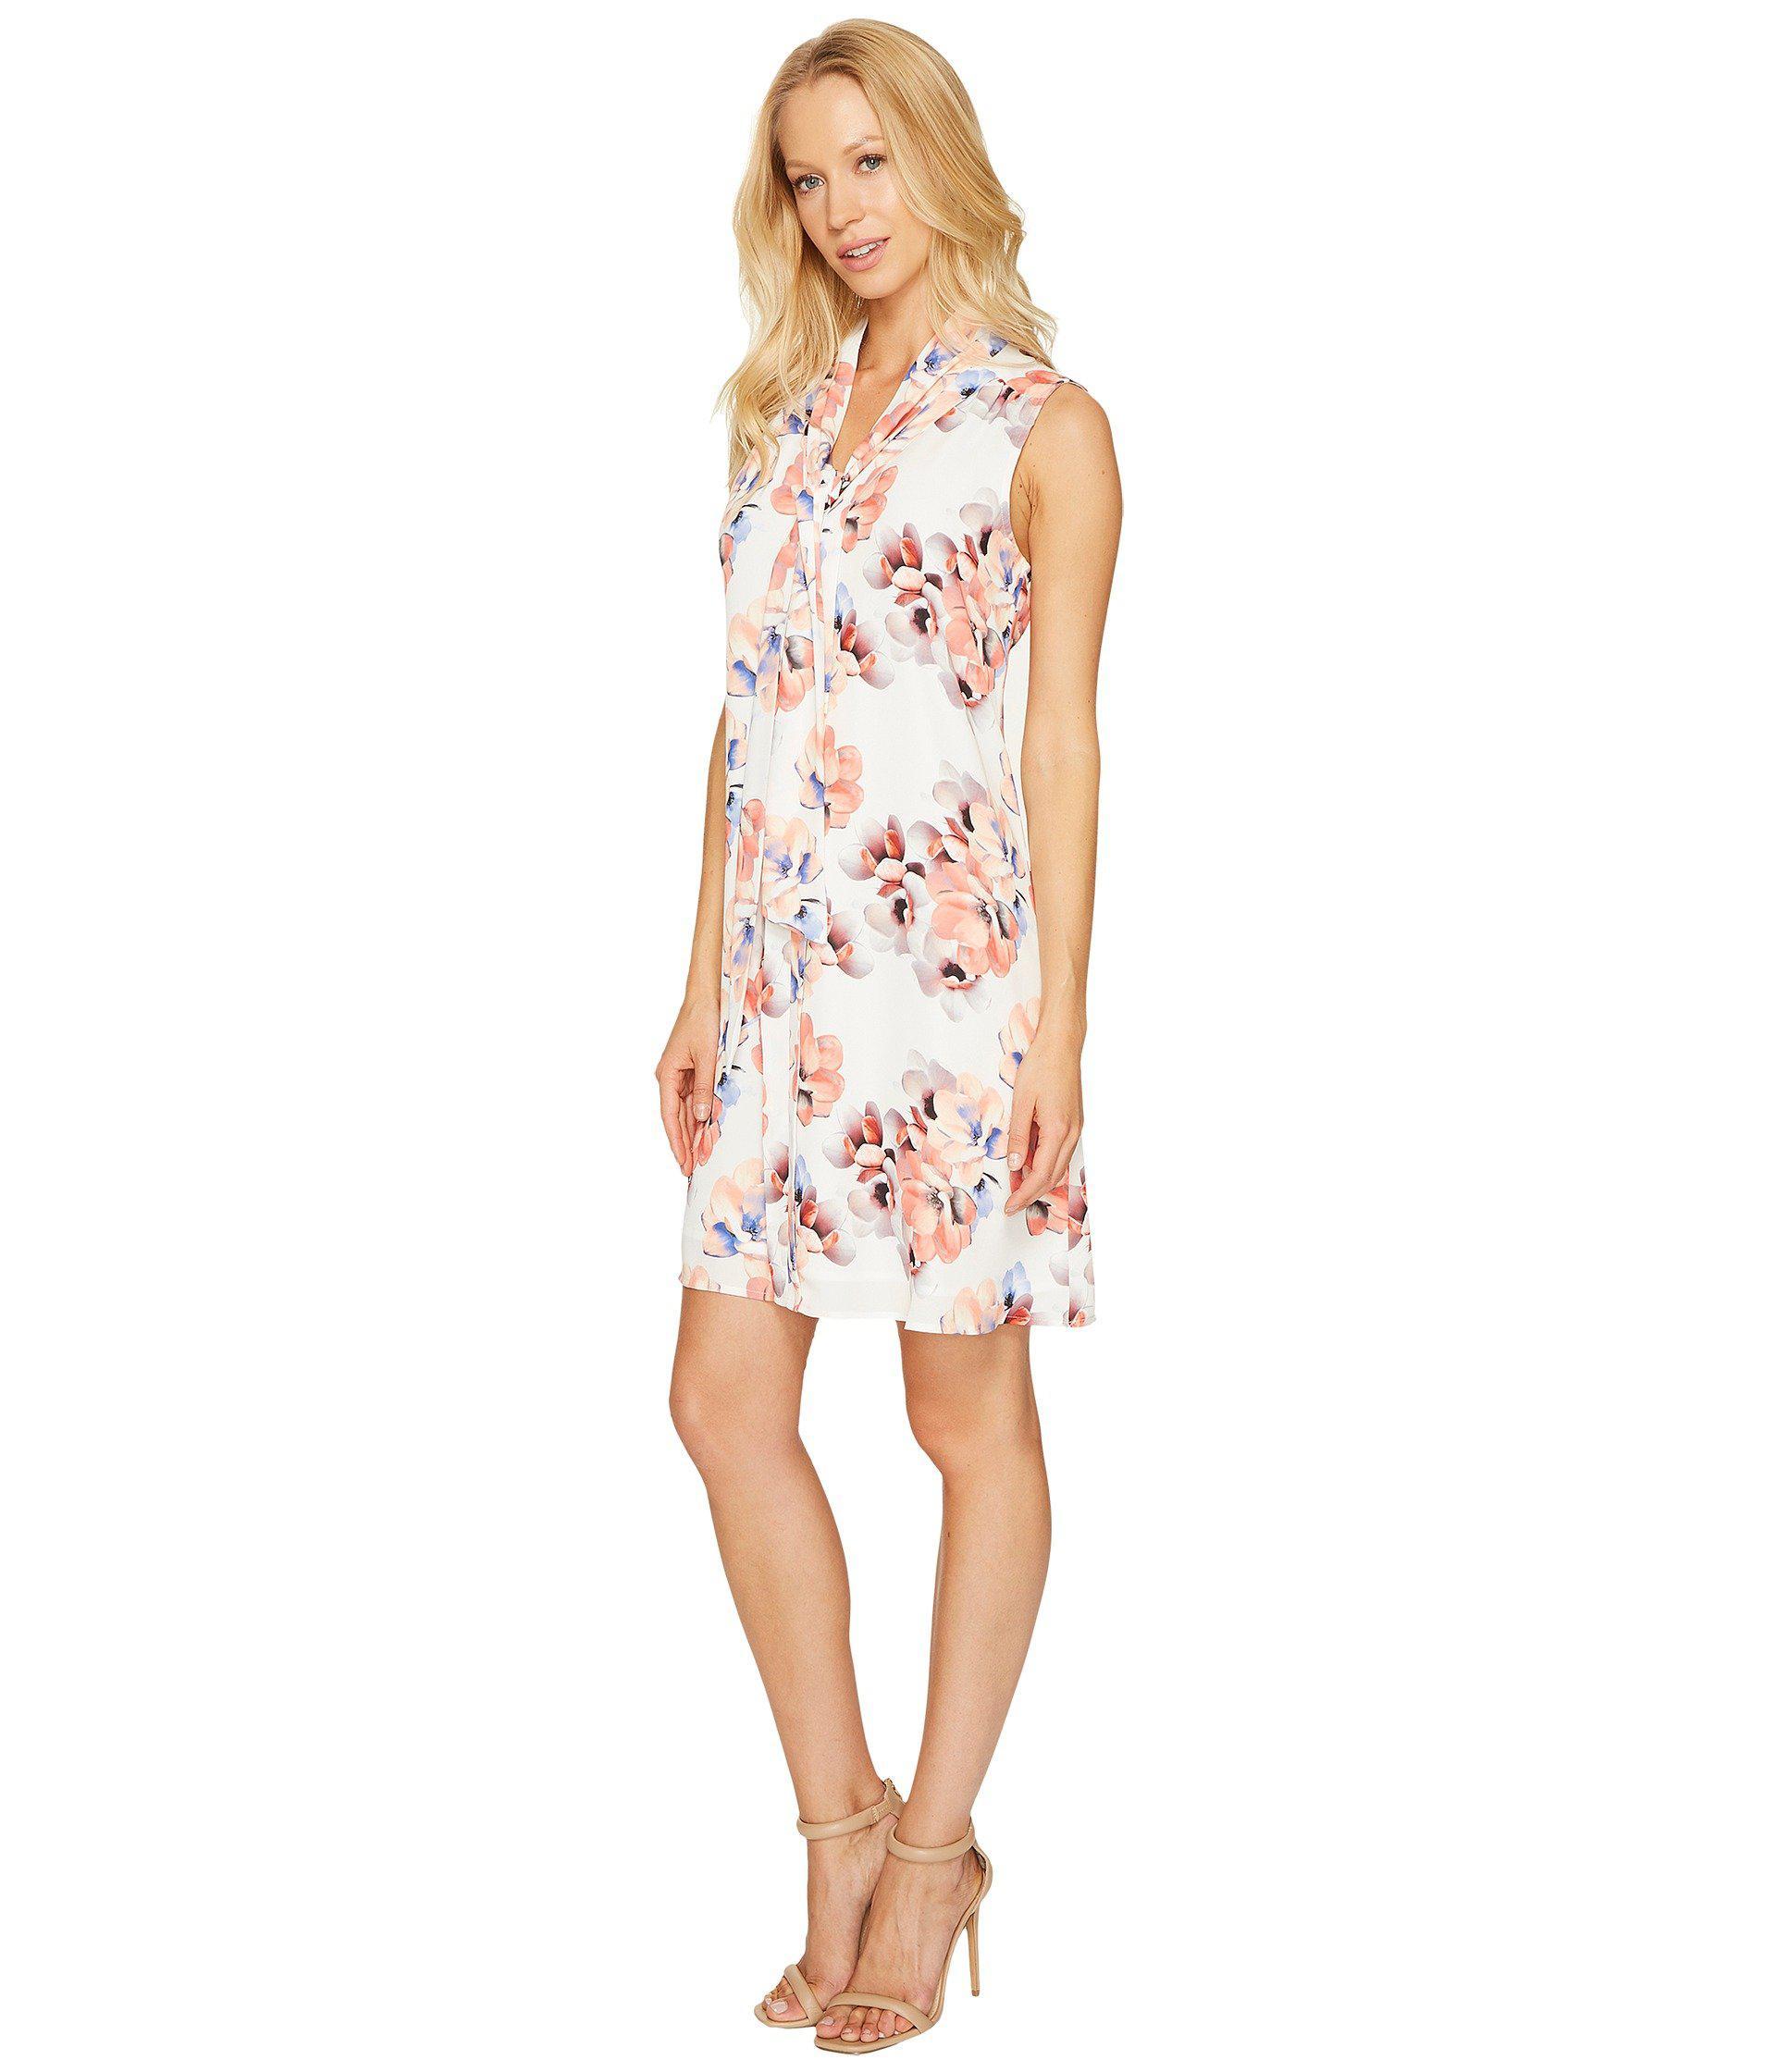 782d2ac29269d Lyst - Cece Sleeveless Garden Blooms Tie Neck Swing Dress in White